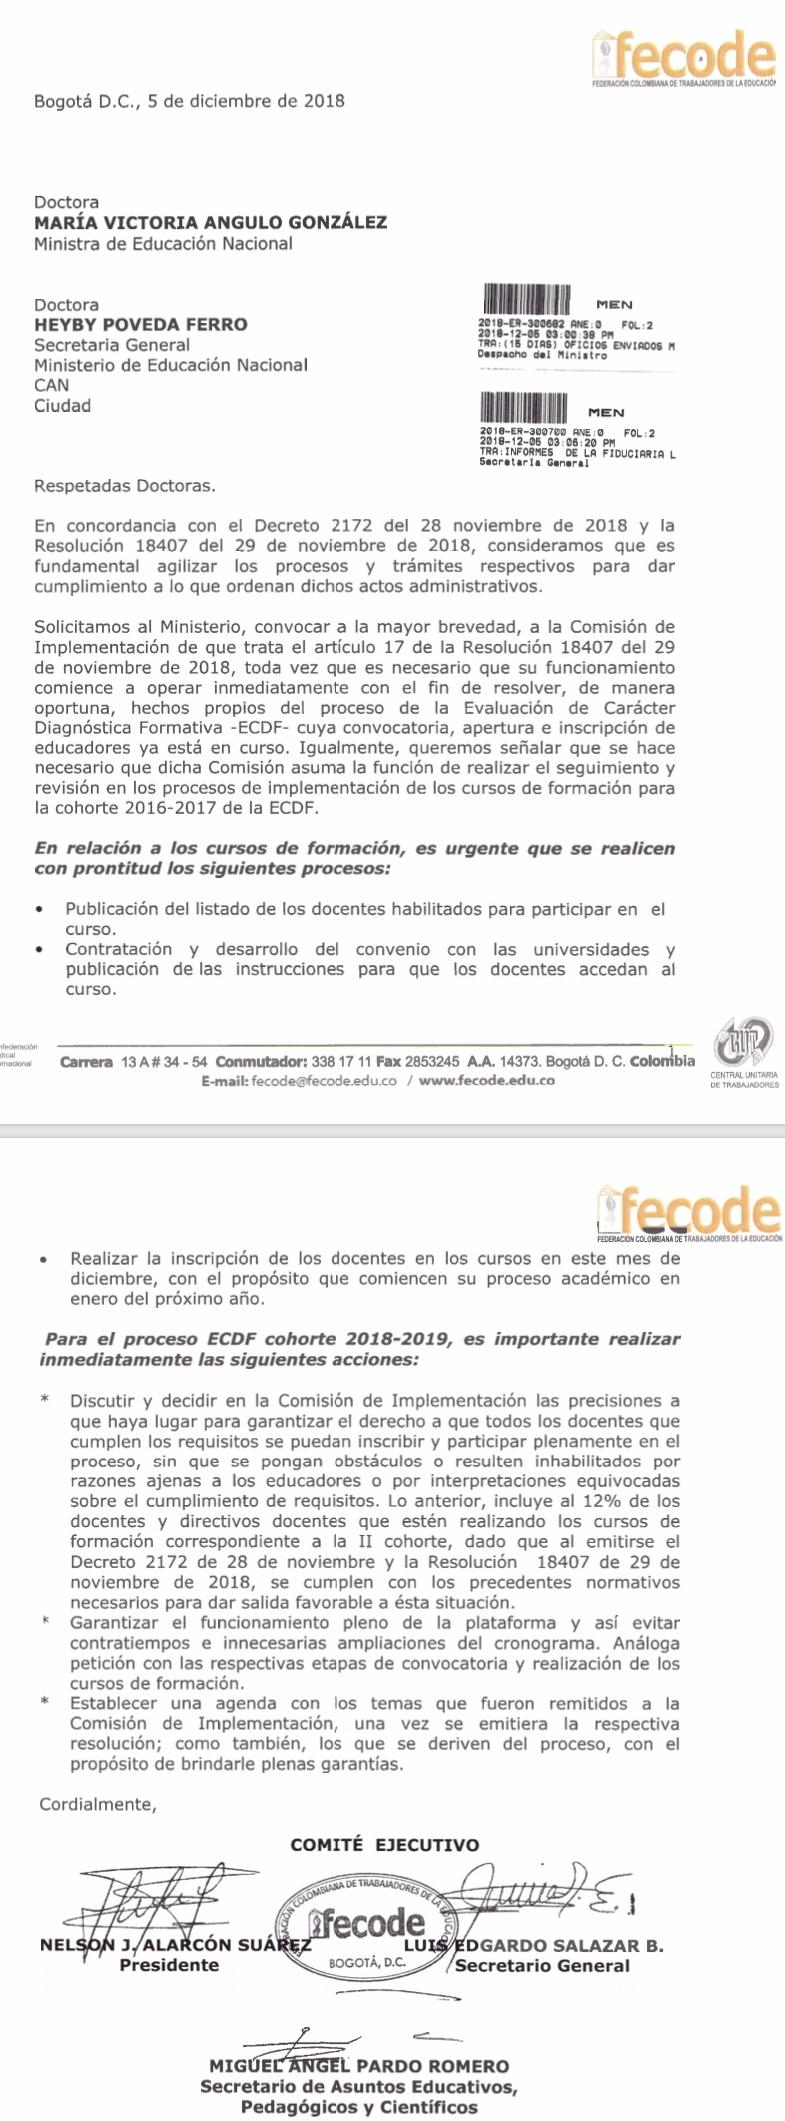 Boletin informativo 6 de diciembre de 2018 – Omar Arango Jiménez